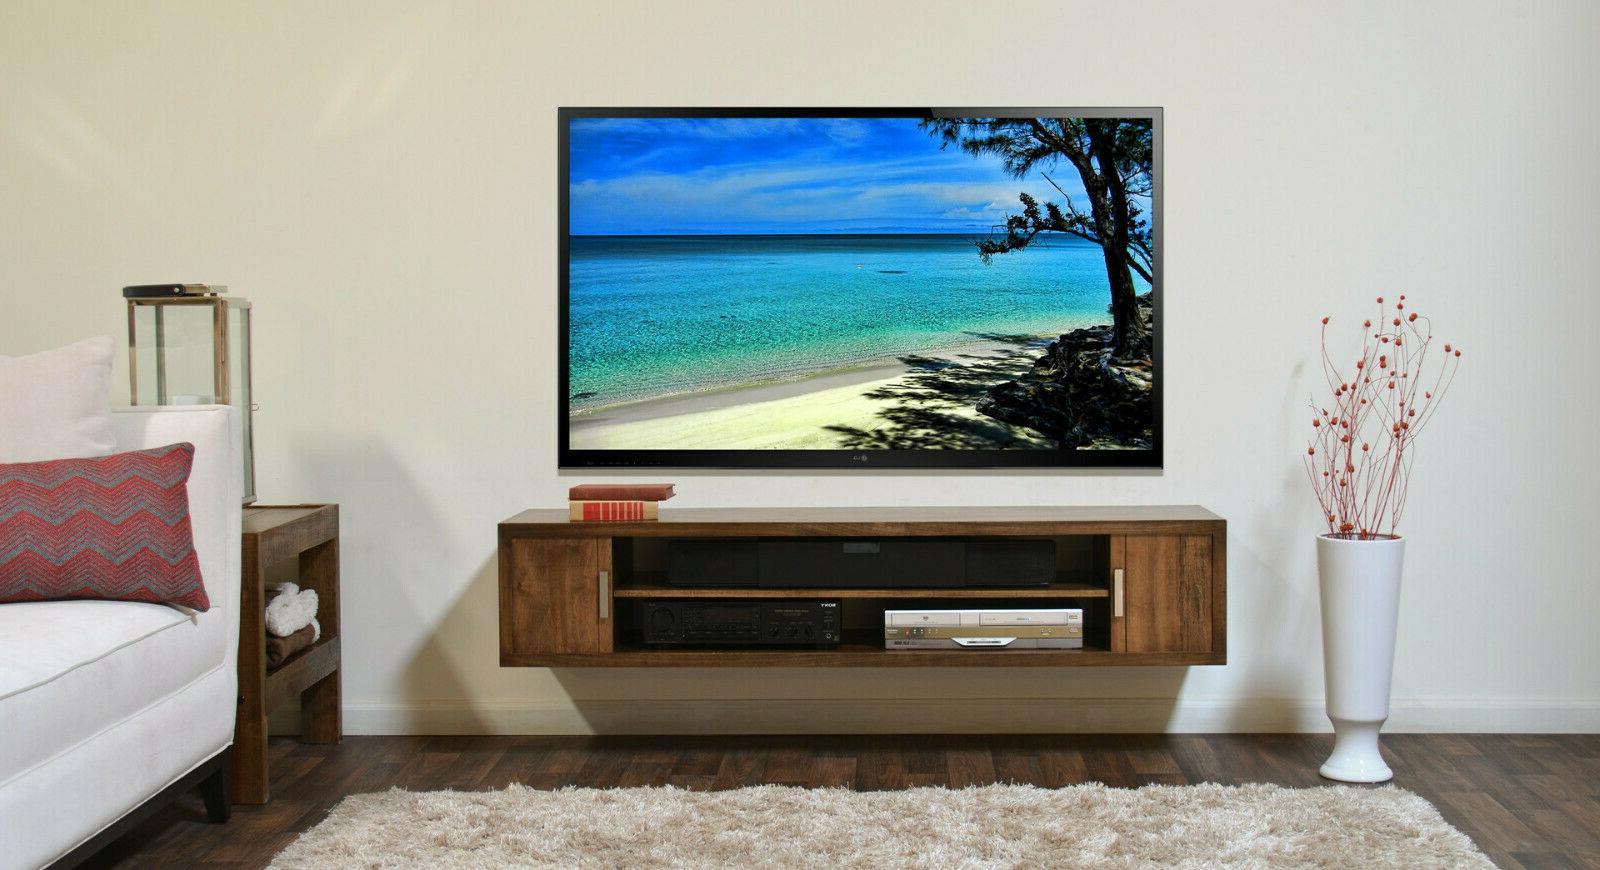 "Wall Mount for 60"" Slim TV Bracket Screen"